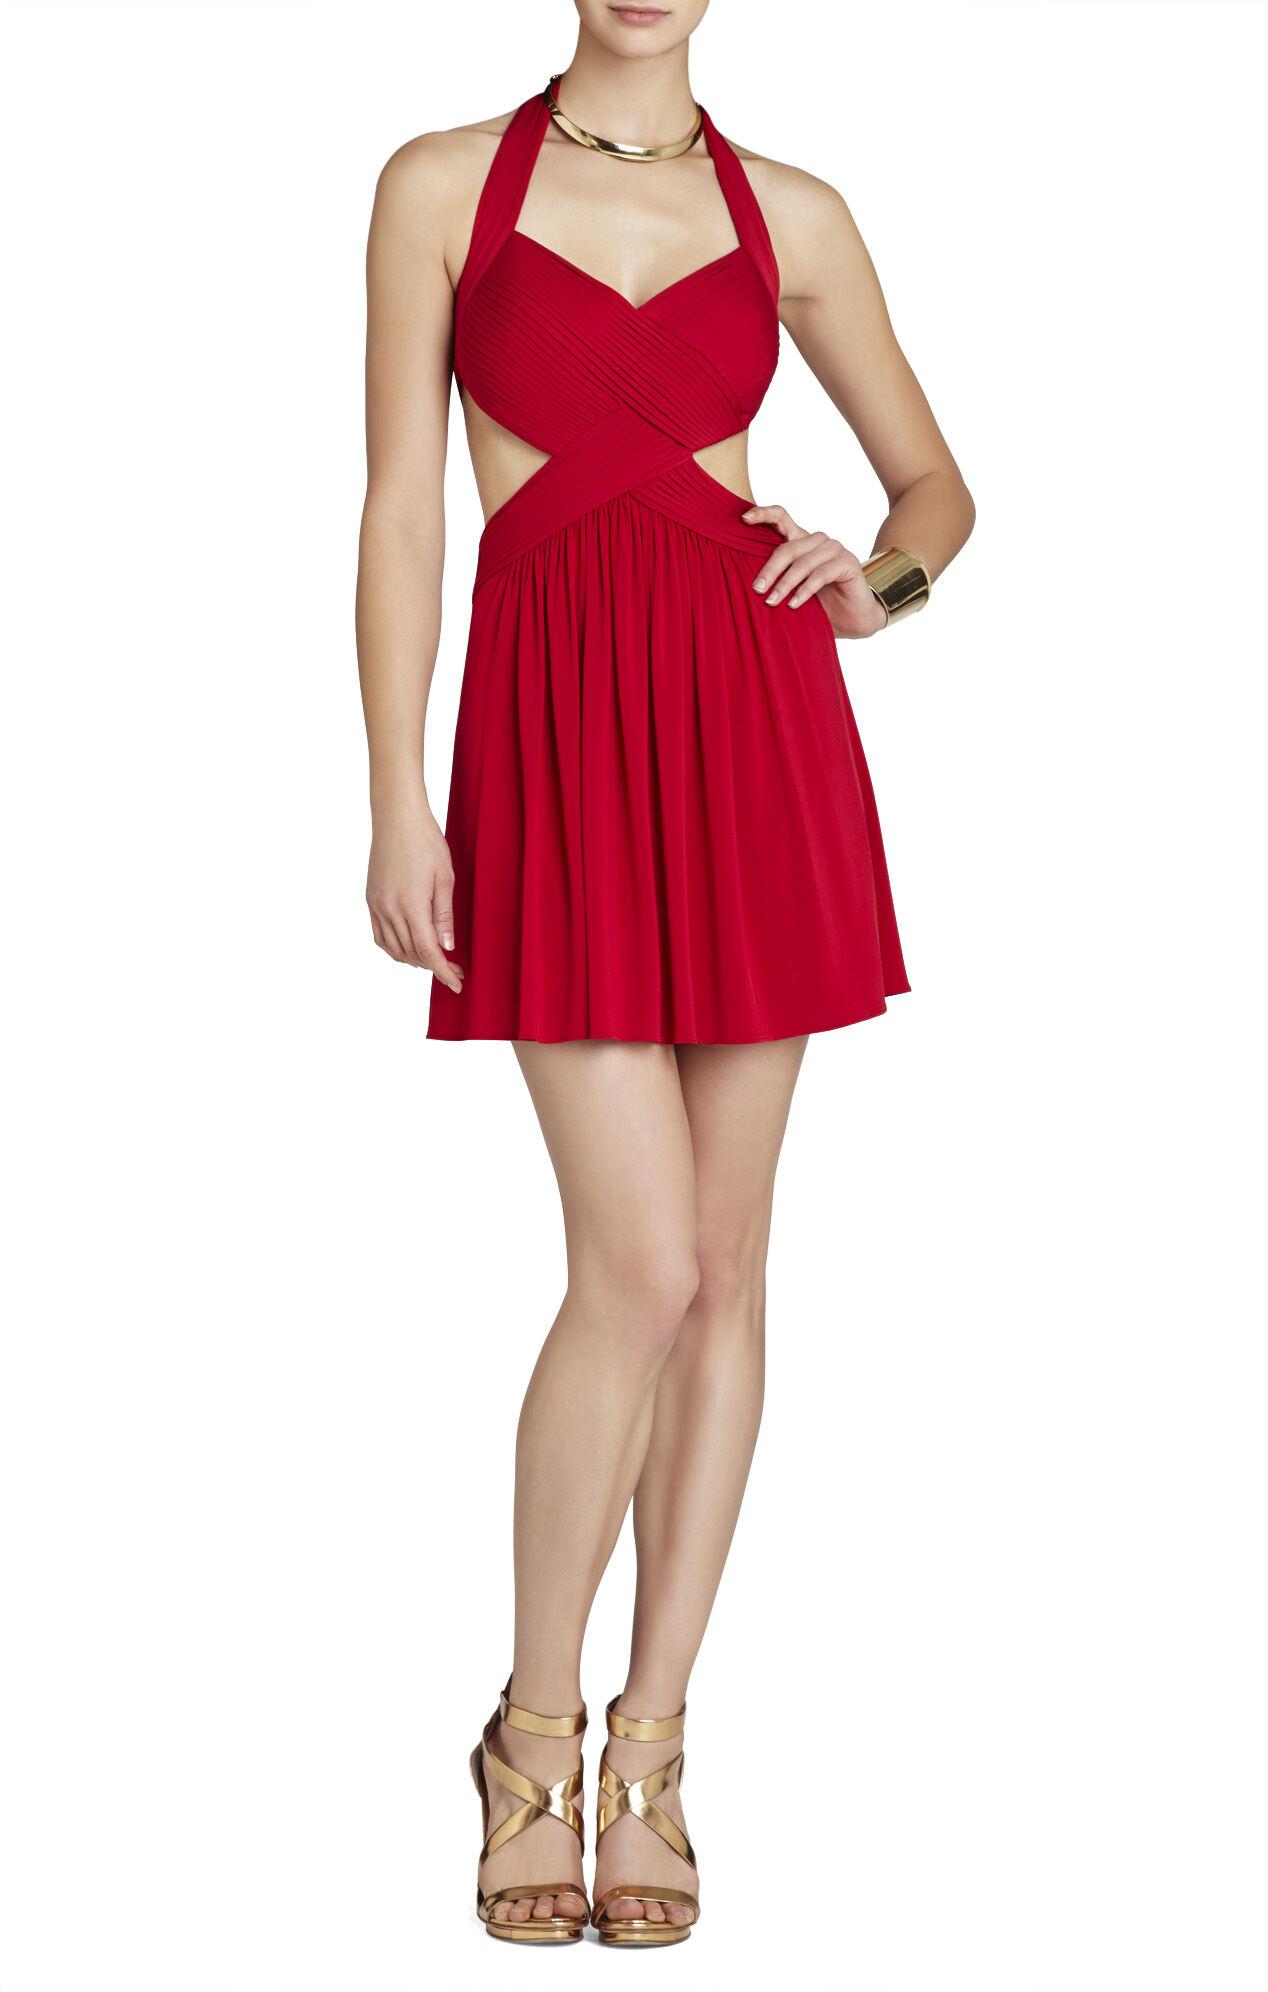 Chiffon Prom Dress with Halter Neckline | Style 99147 ...  |Halter Cocktail Dresses